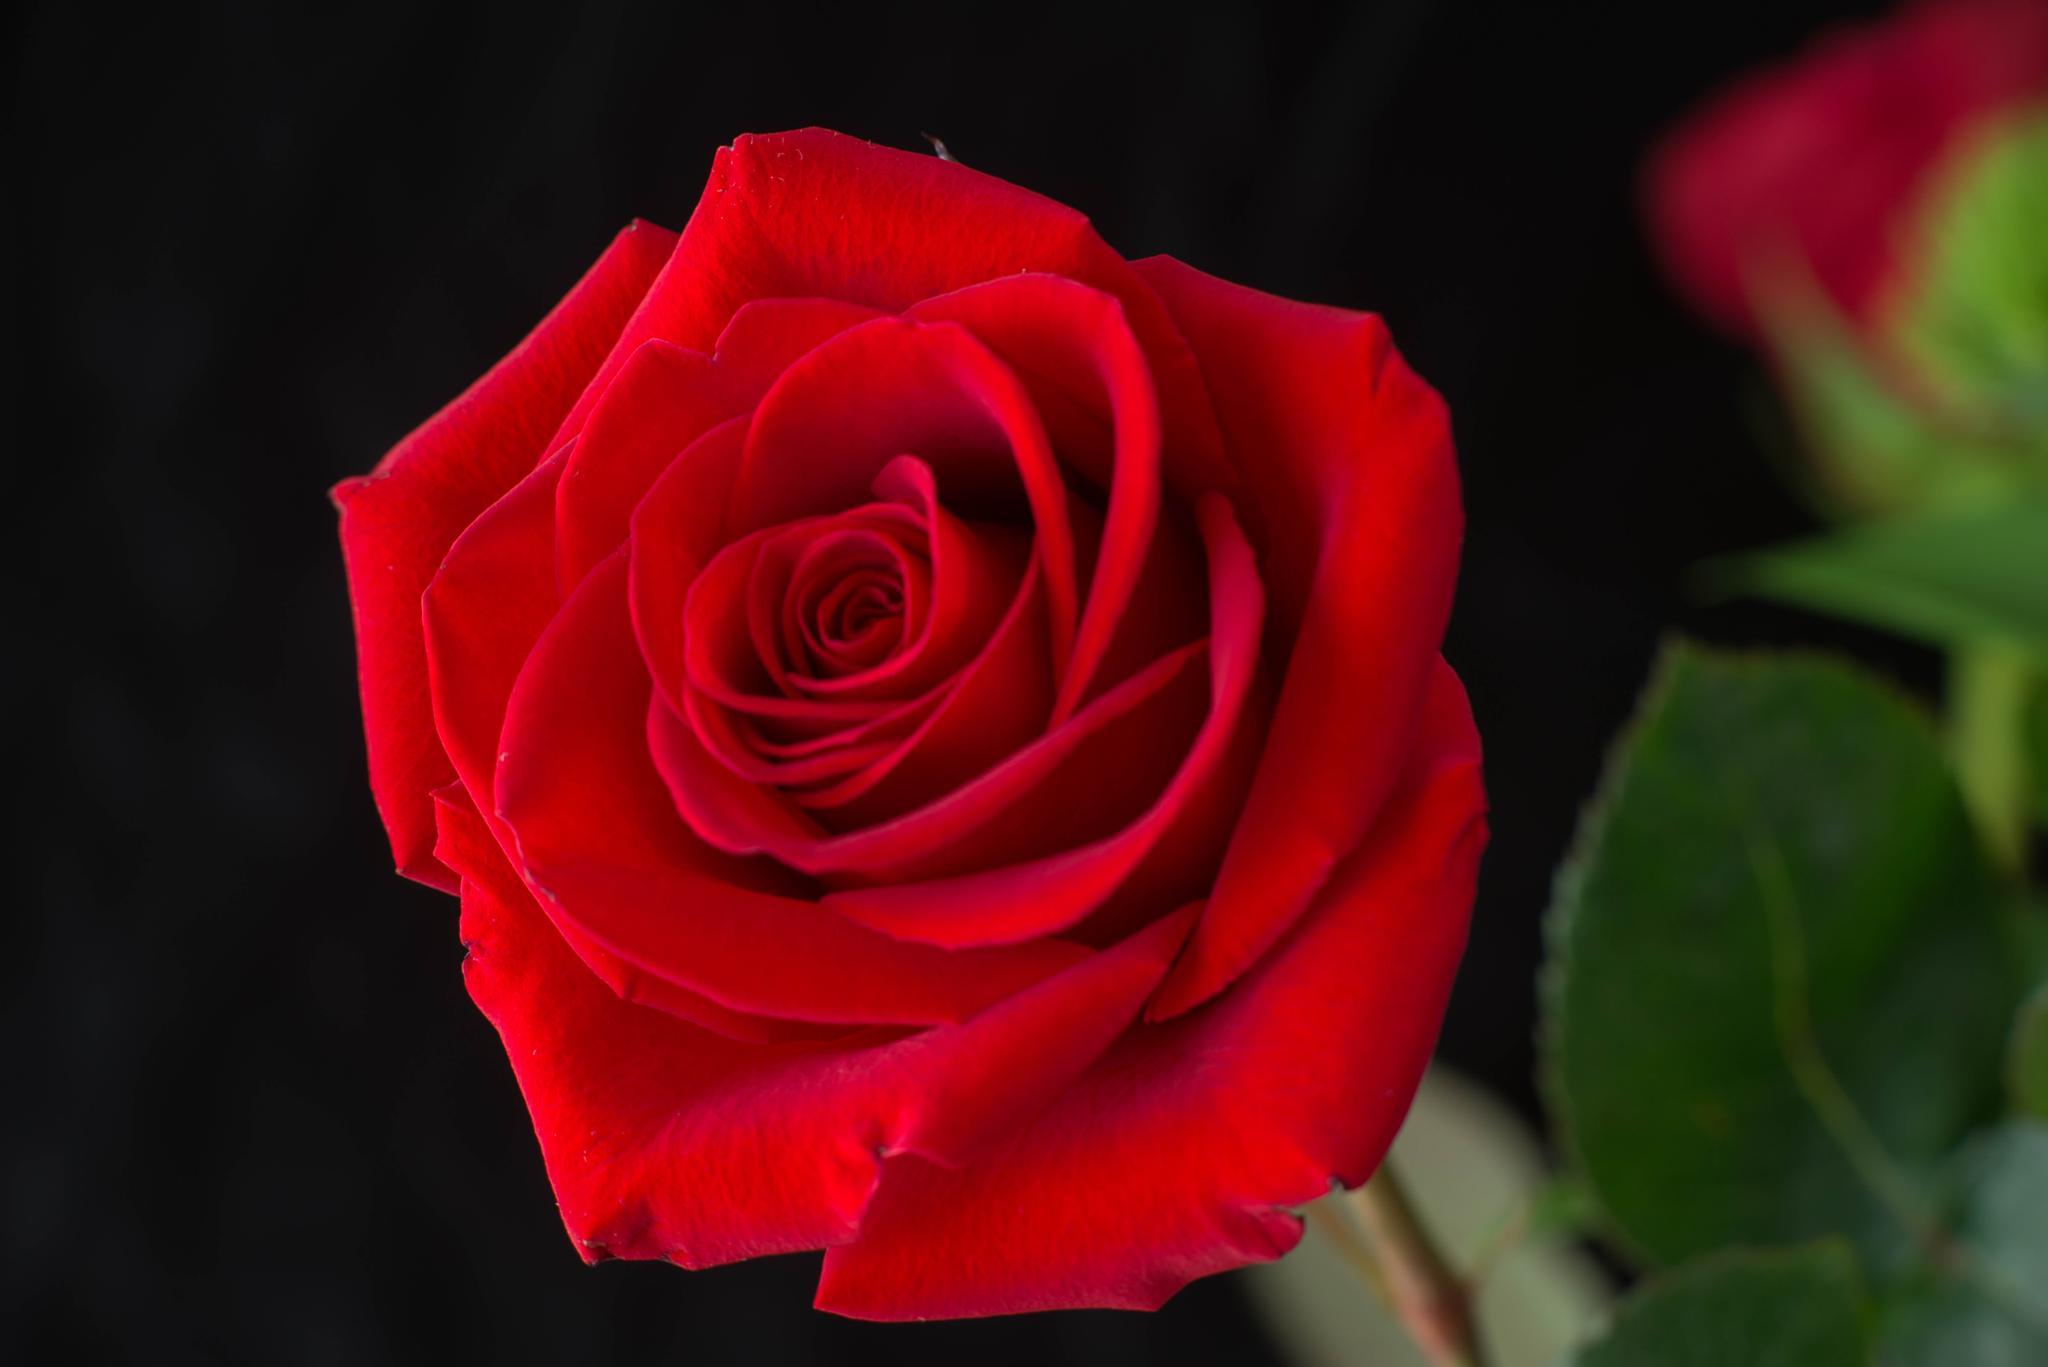 Rose by ramesh thyagarajan